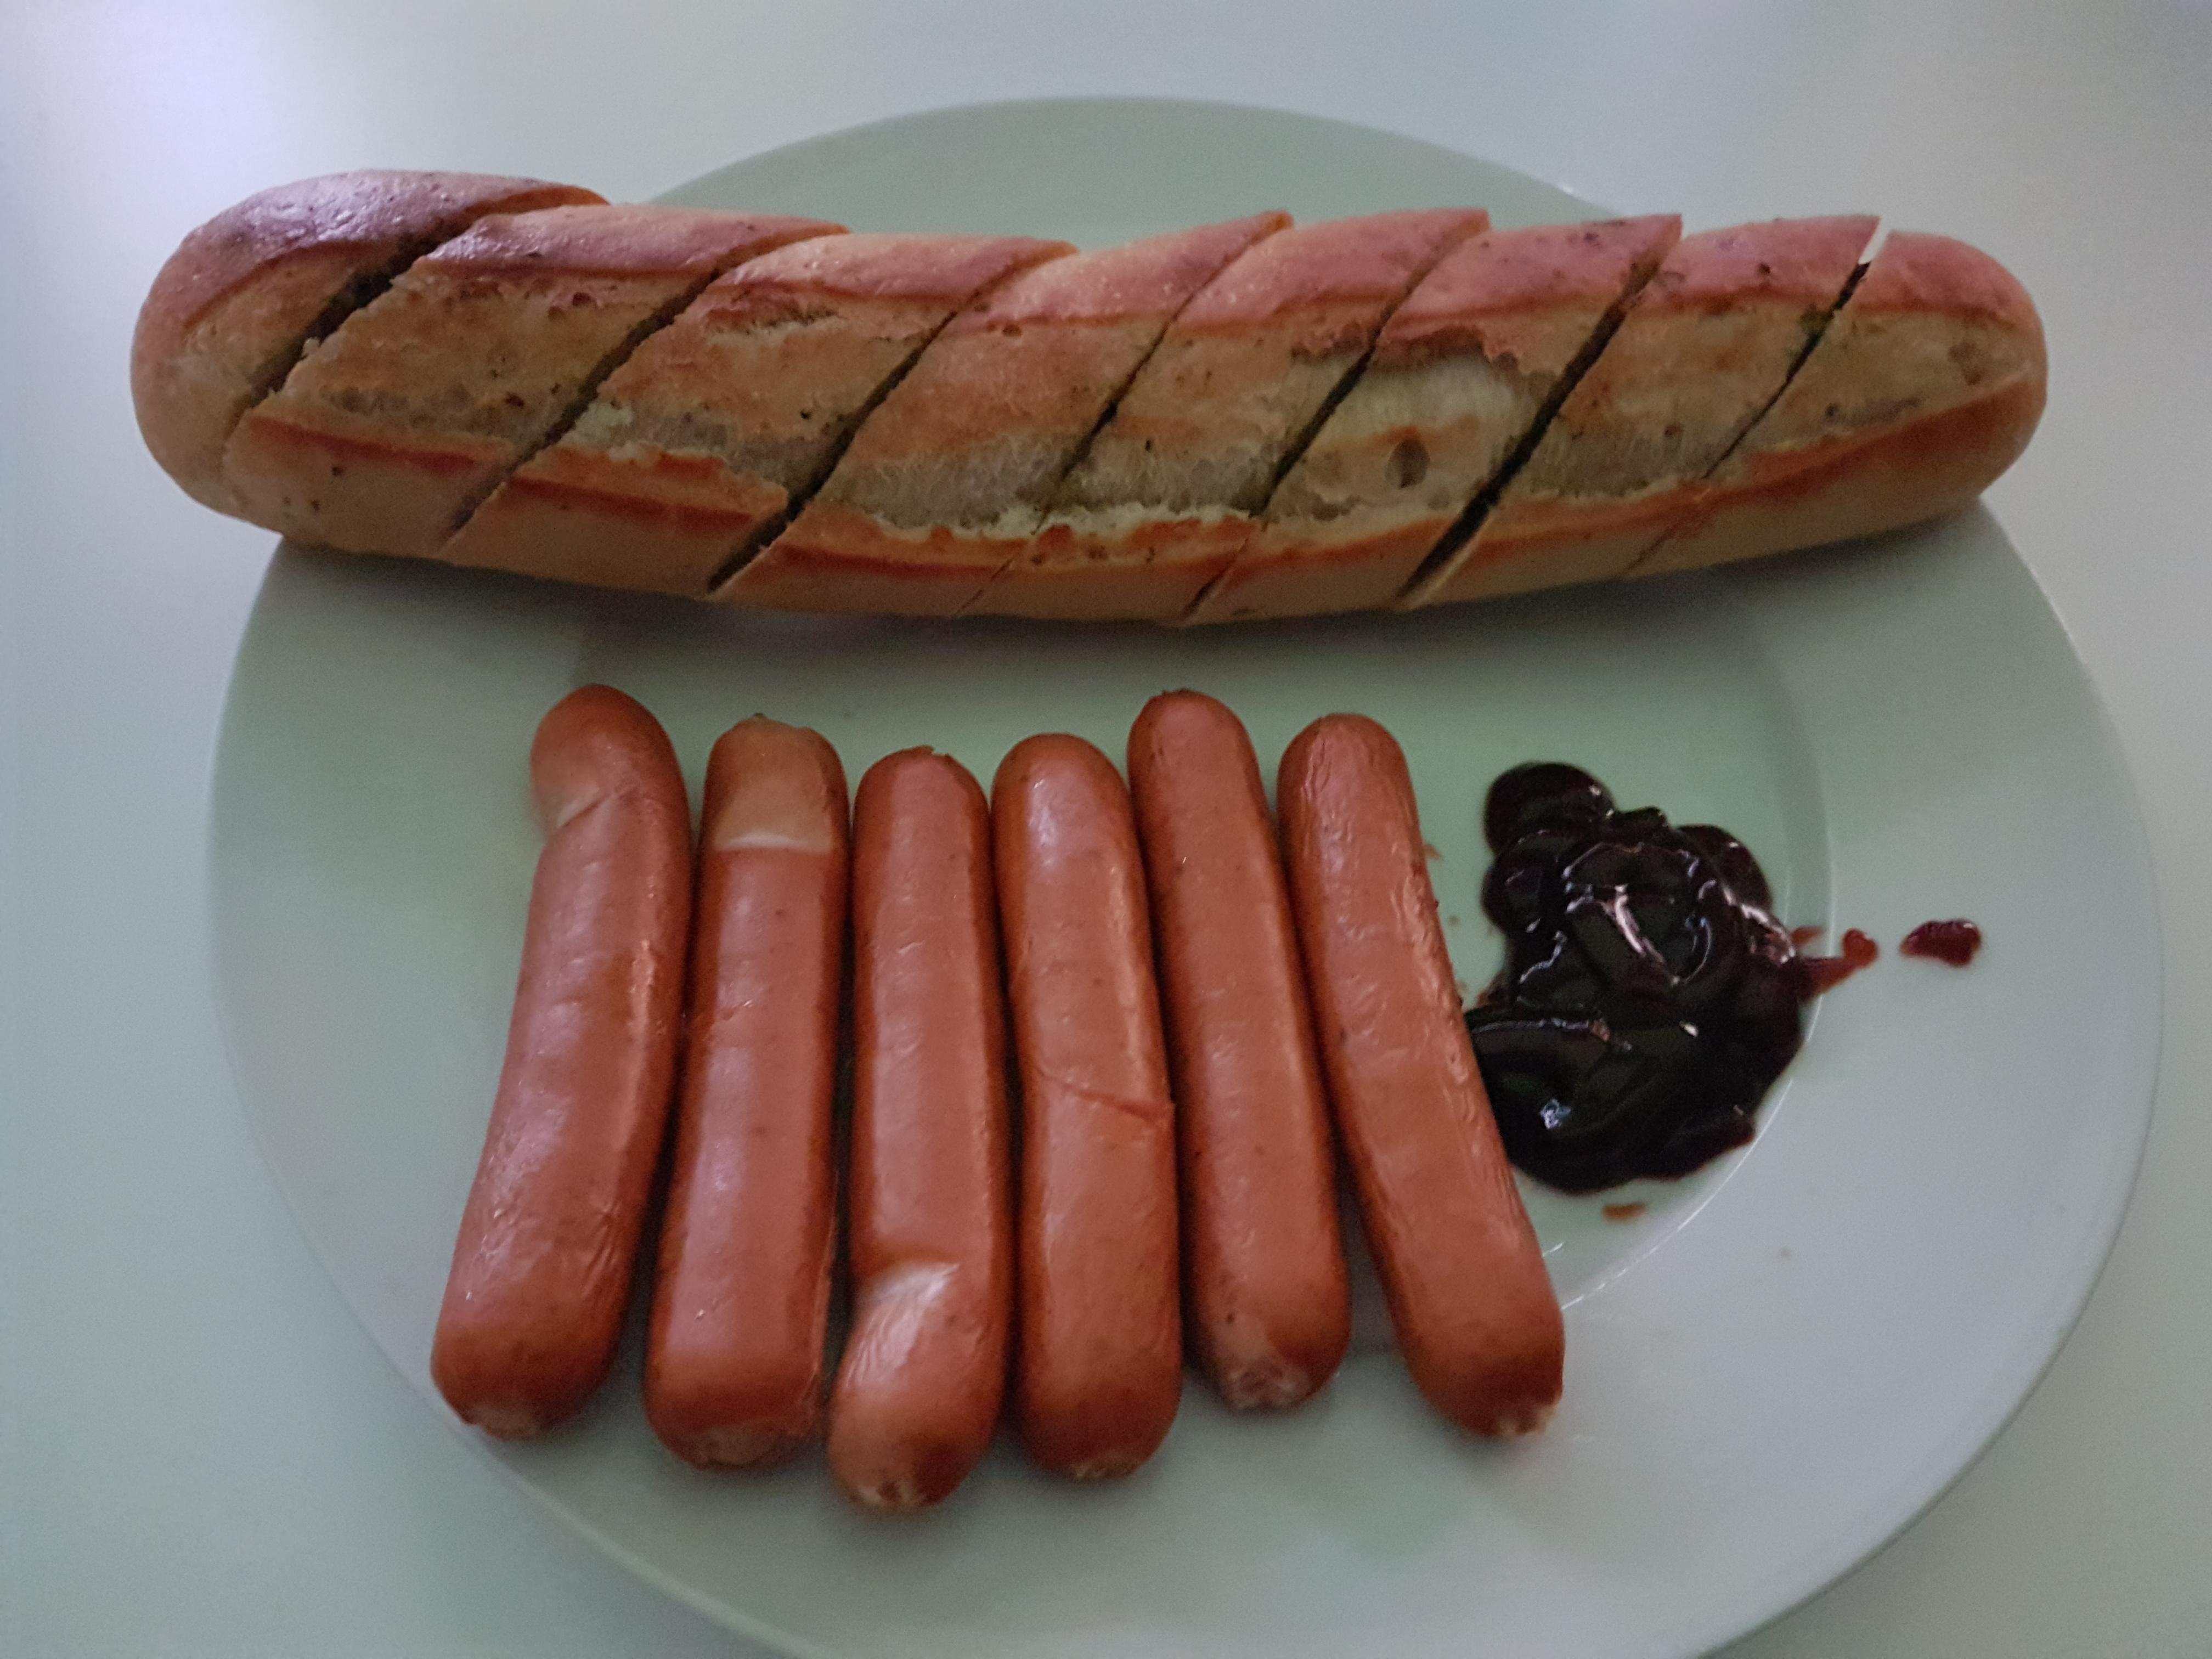 http://foodloader.net/Holz_2017-10-04_Mini-Kaesekrainer_mit_Kraeuterbaguette.jpg